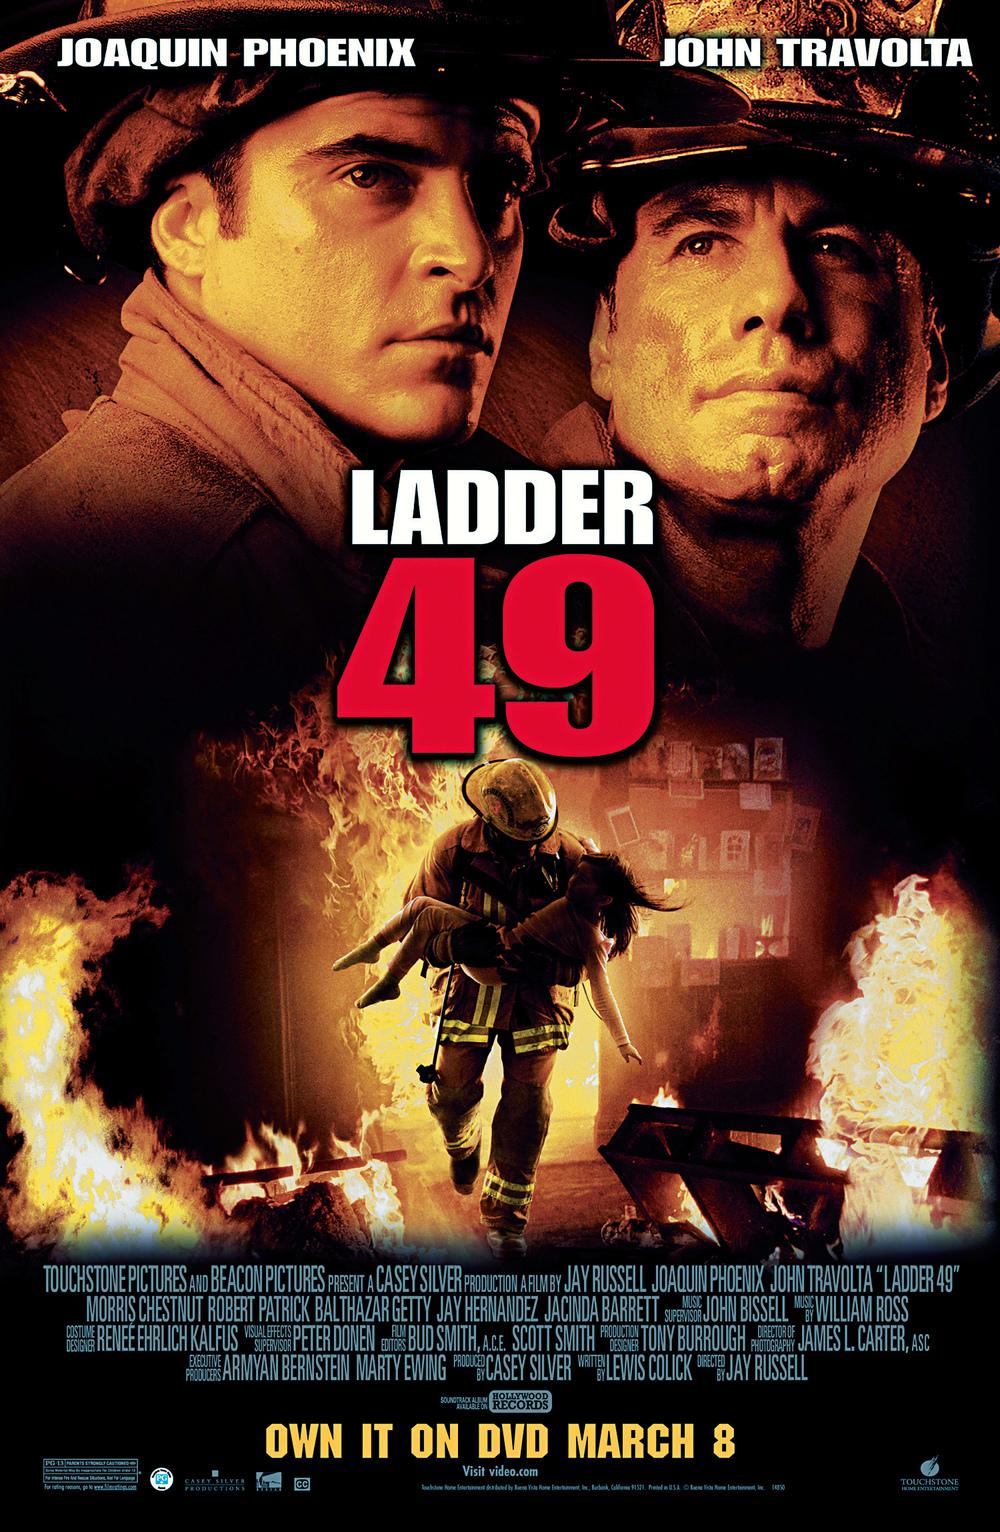 ladder49++++.jpg